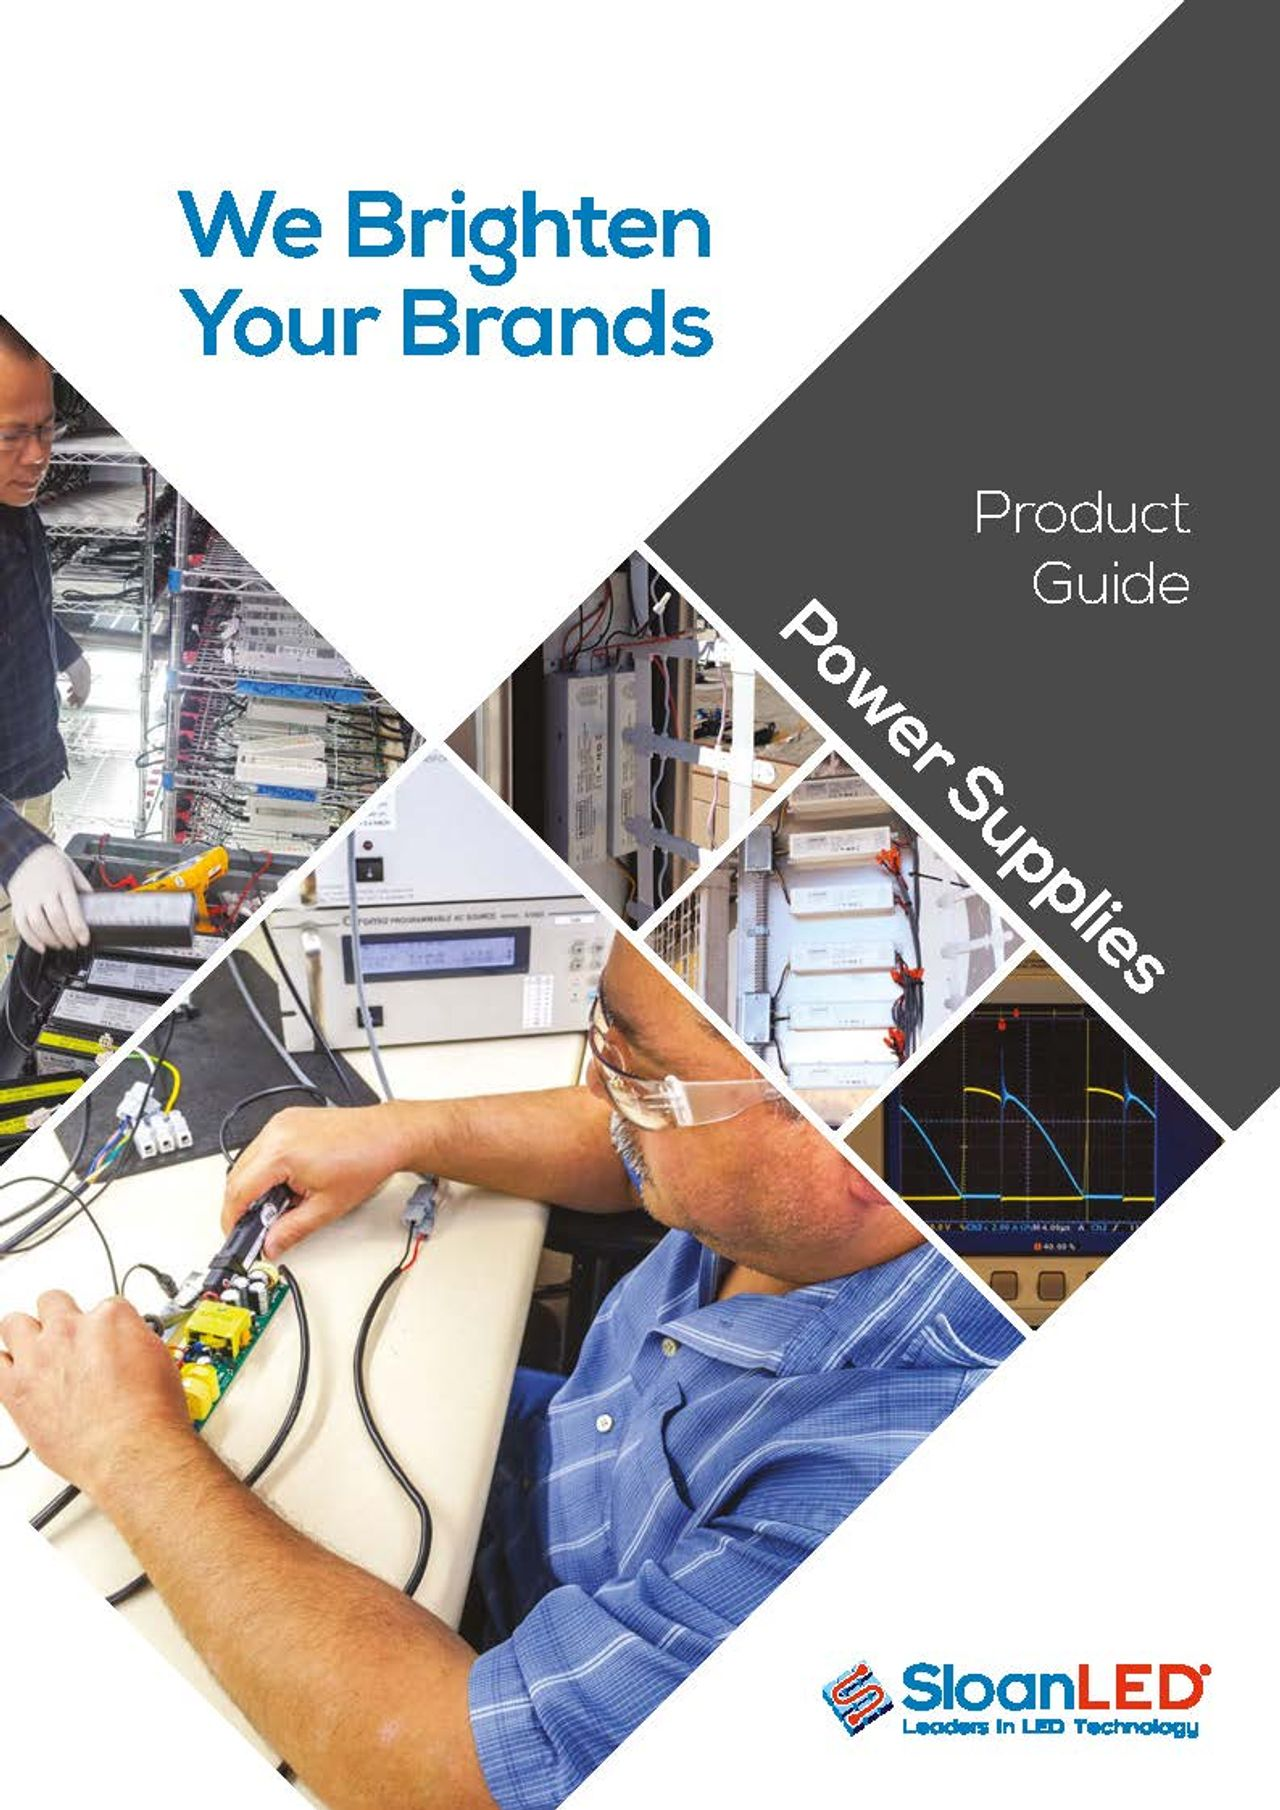 Afbeelding SloanLED® Power Supplies